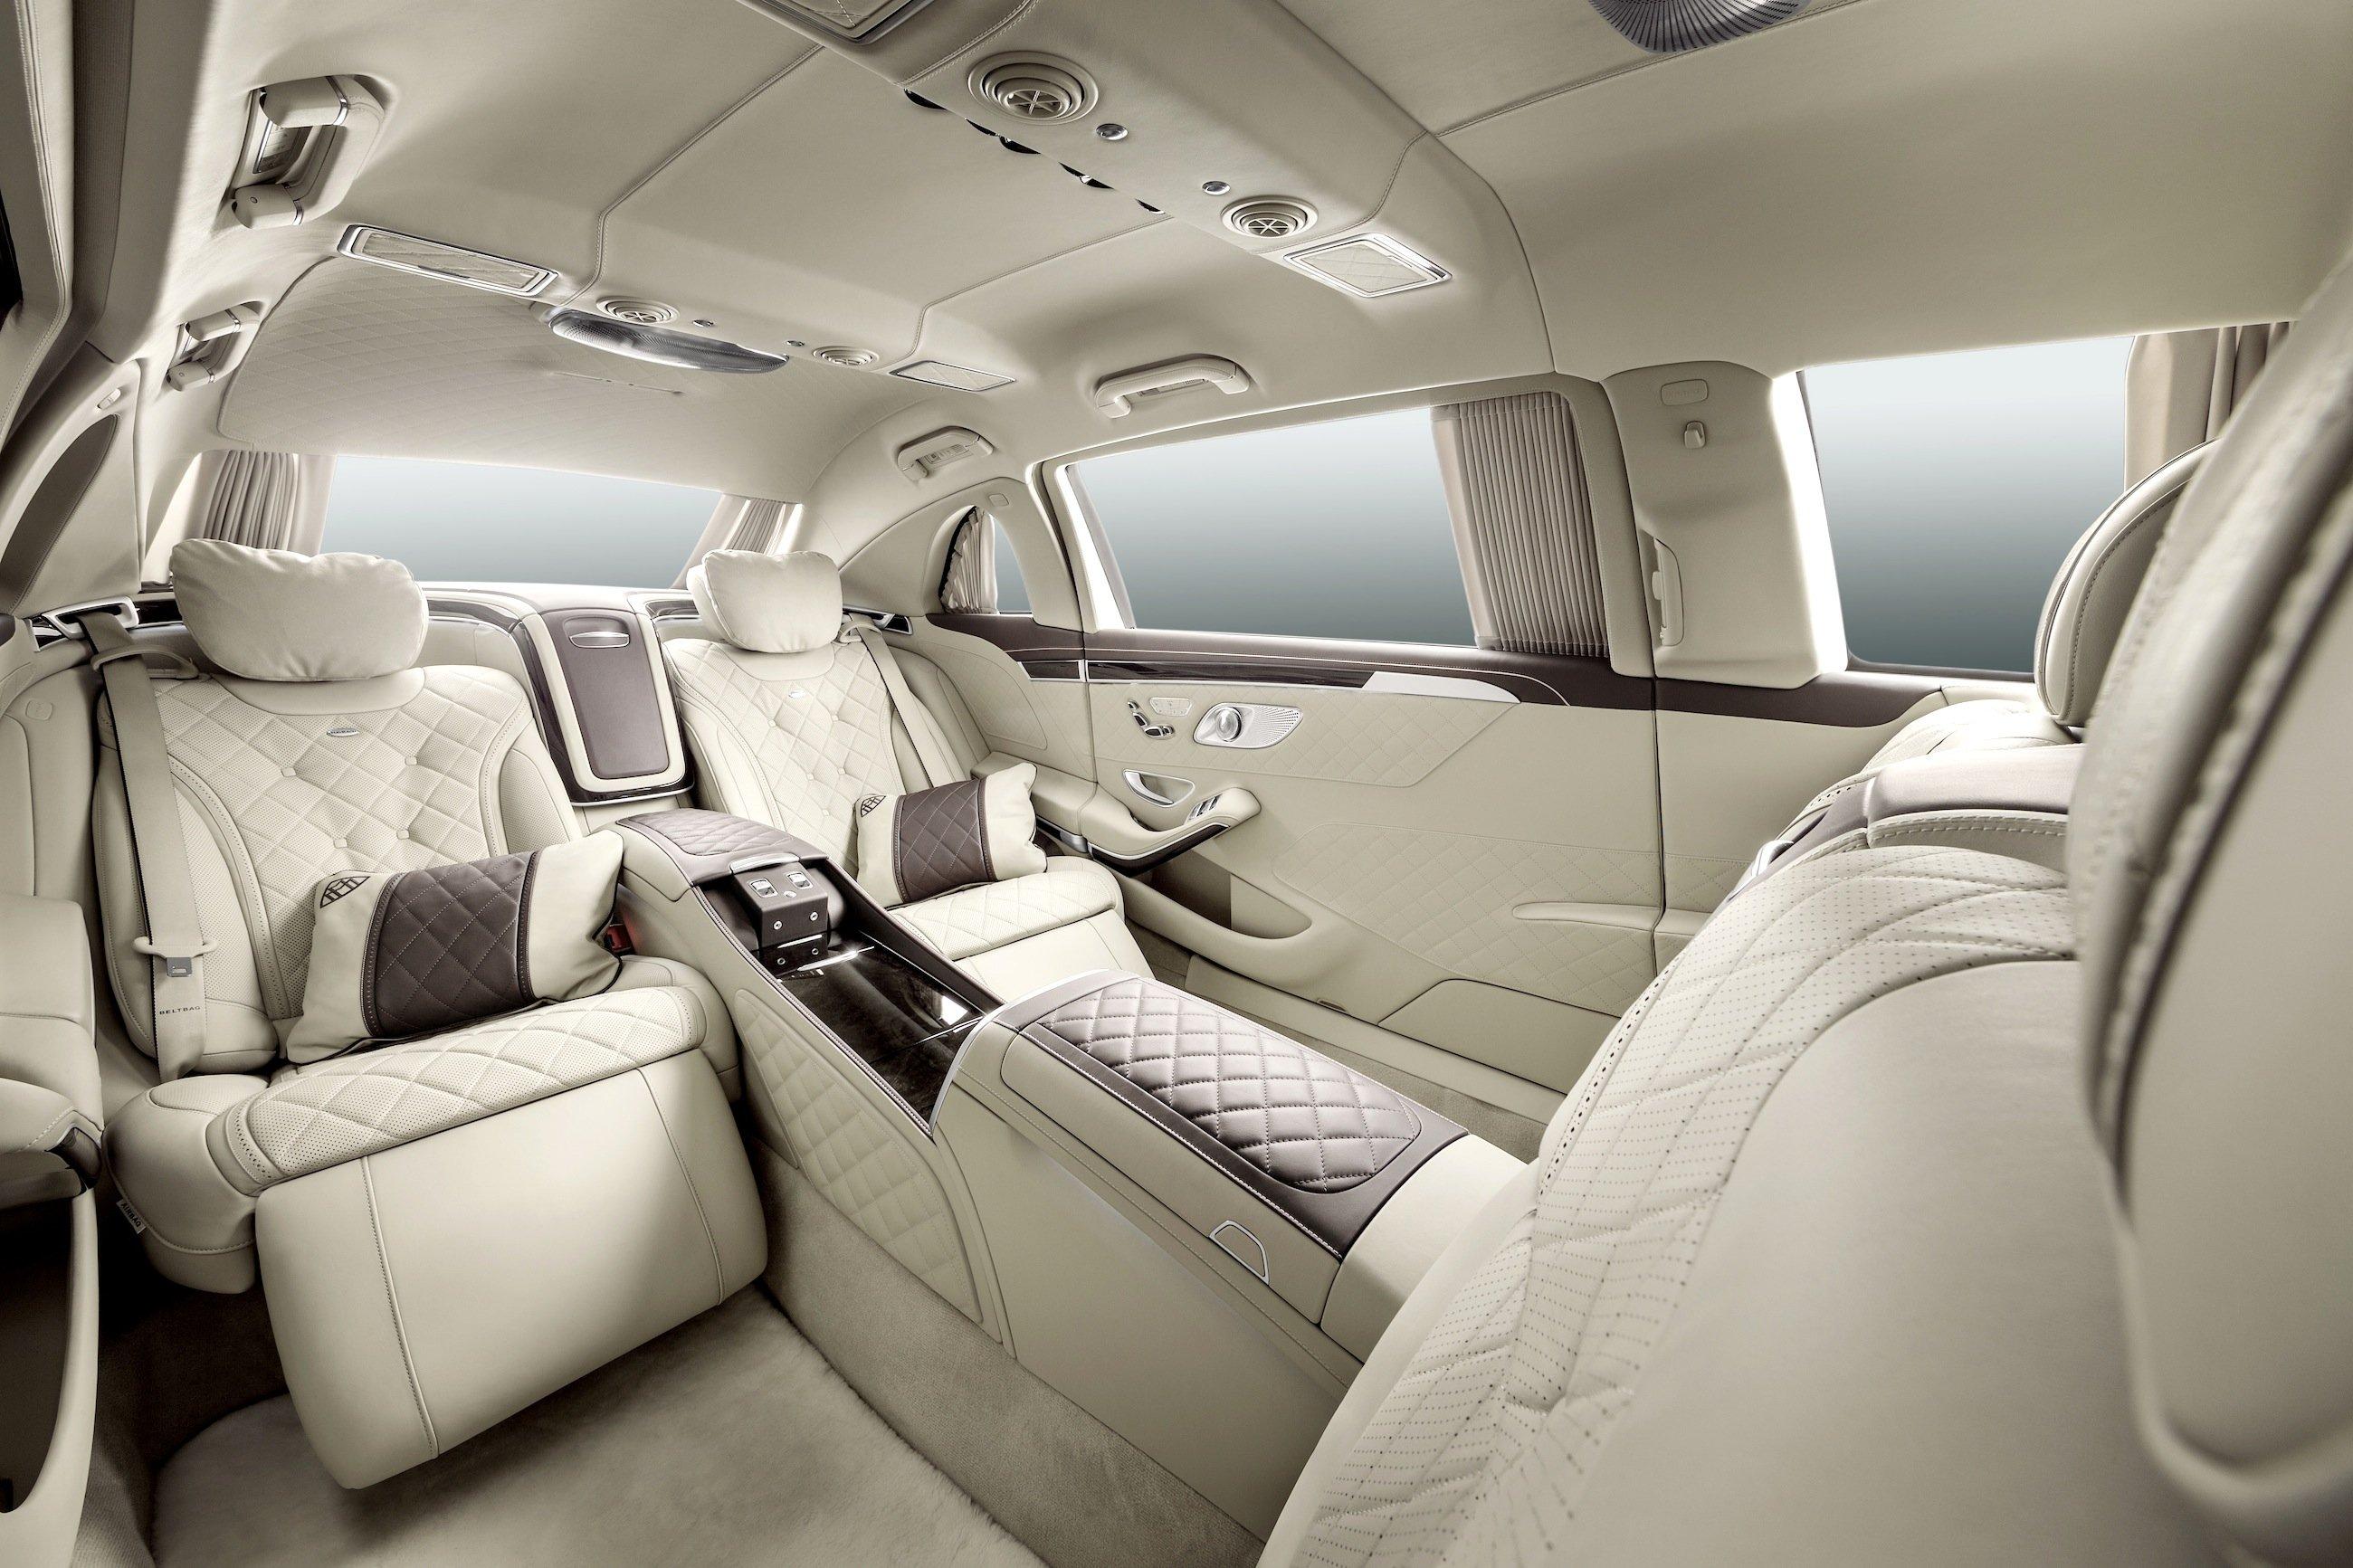 Luxus pur: Großzügiger Innenraum desMaybach S600 Pullmann.